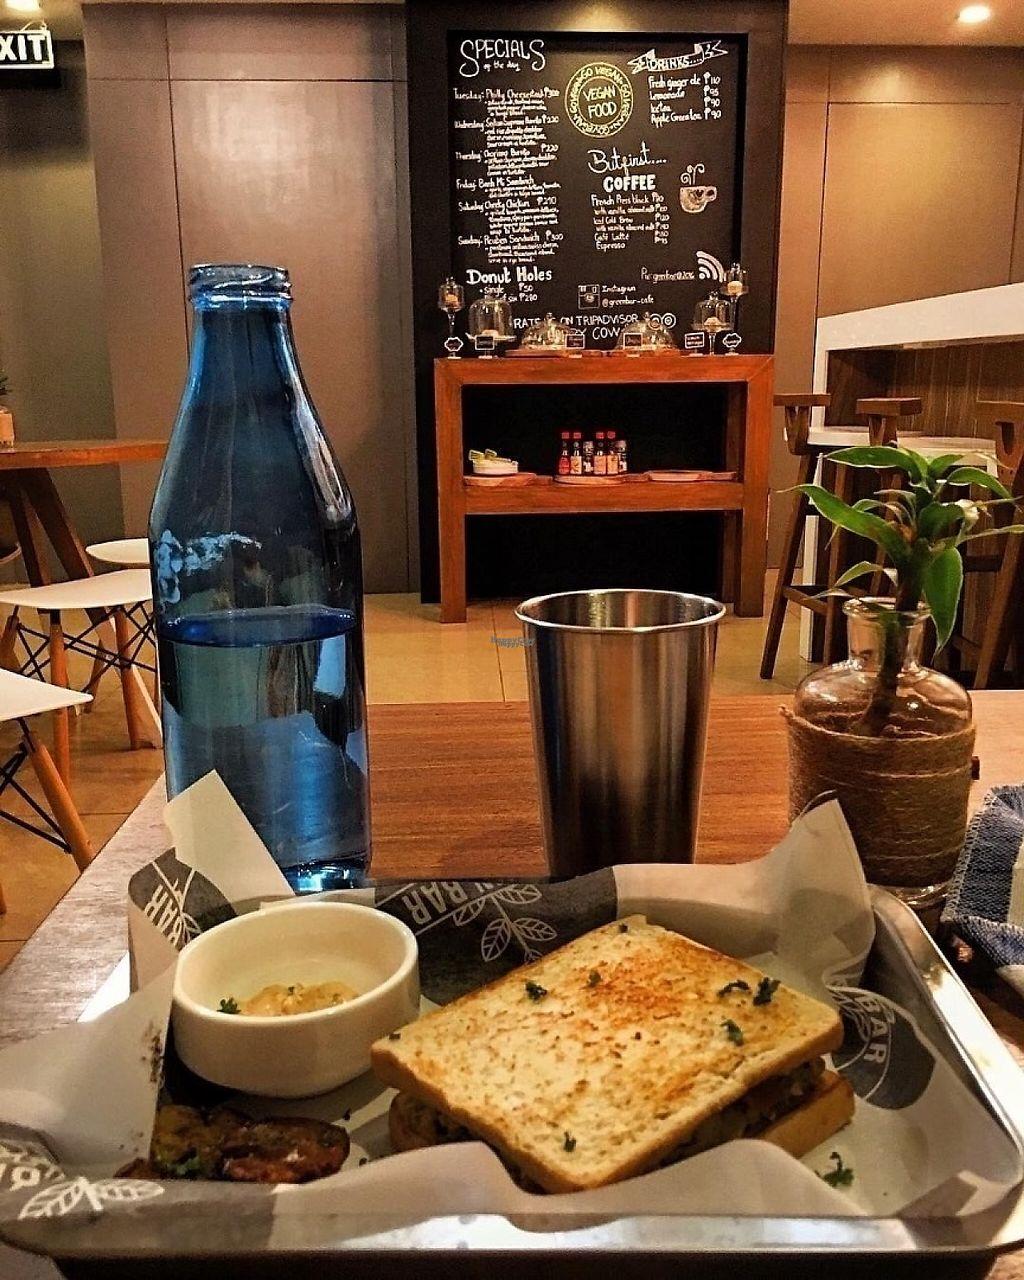 "Photo of Green Bar - Makati  by <a href=""/members/profile/EminaYjjou"">EminaYjjou</a> <br/>Scrambled V-egg <br/> March 8, 2017  - <a href='/contact/abuse/image/68402/234135'>Report</a>"